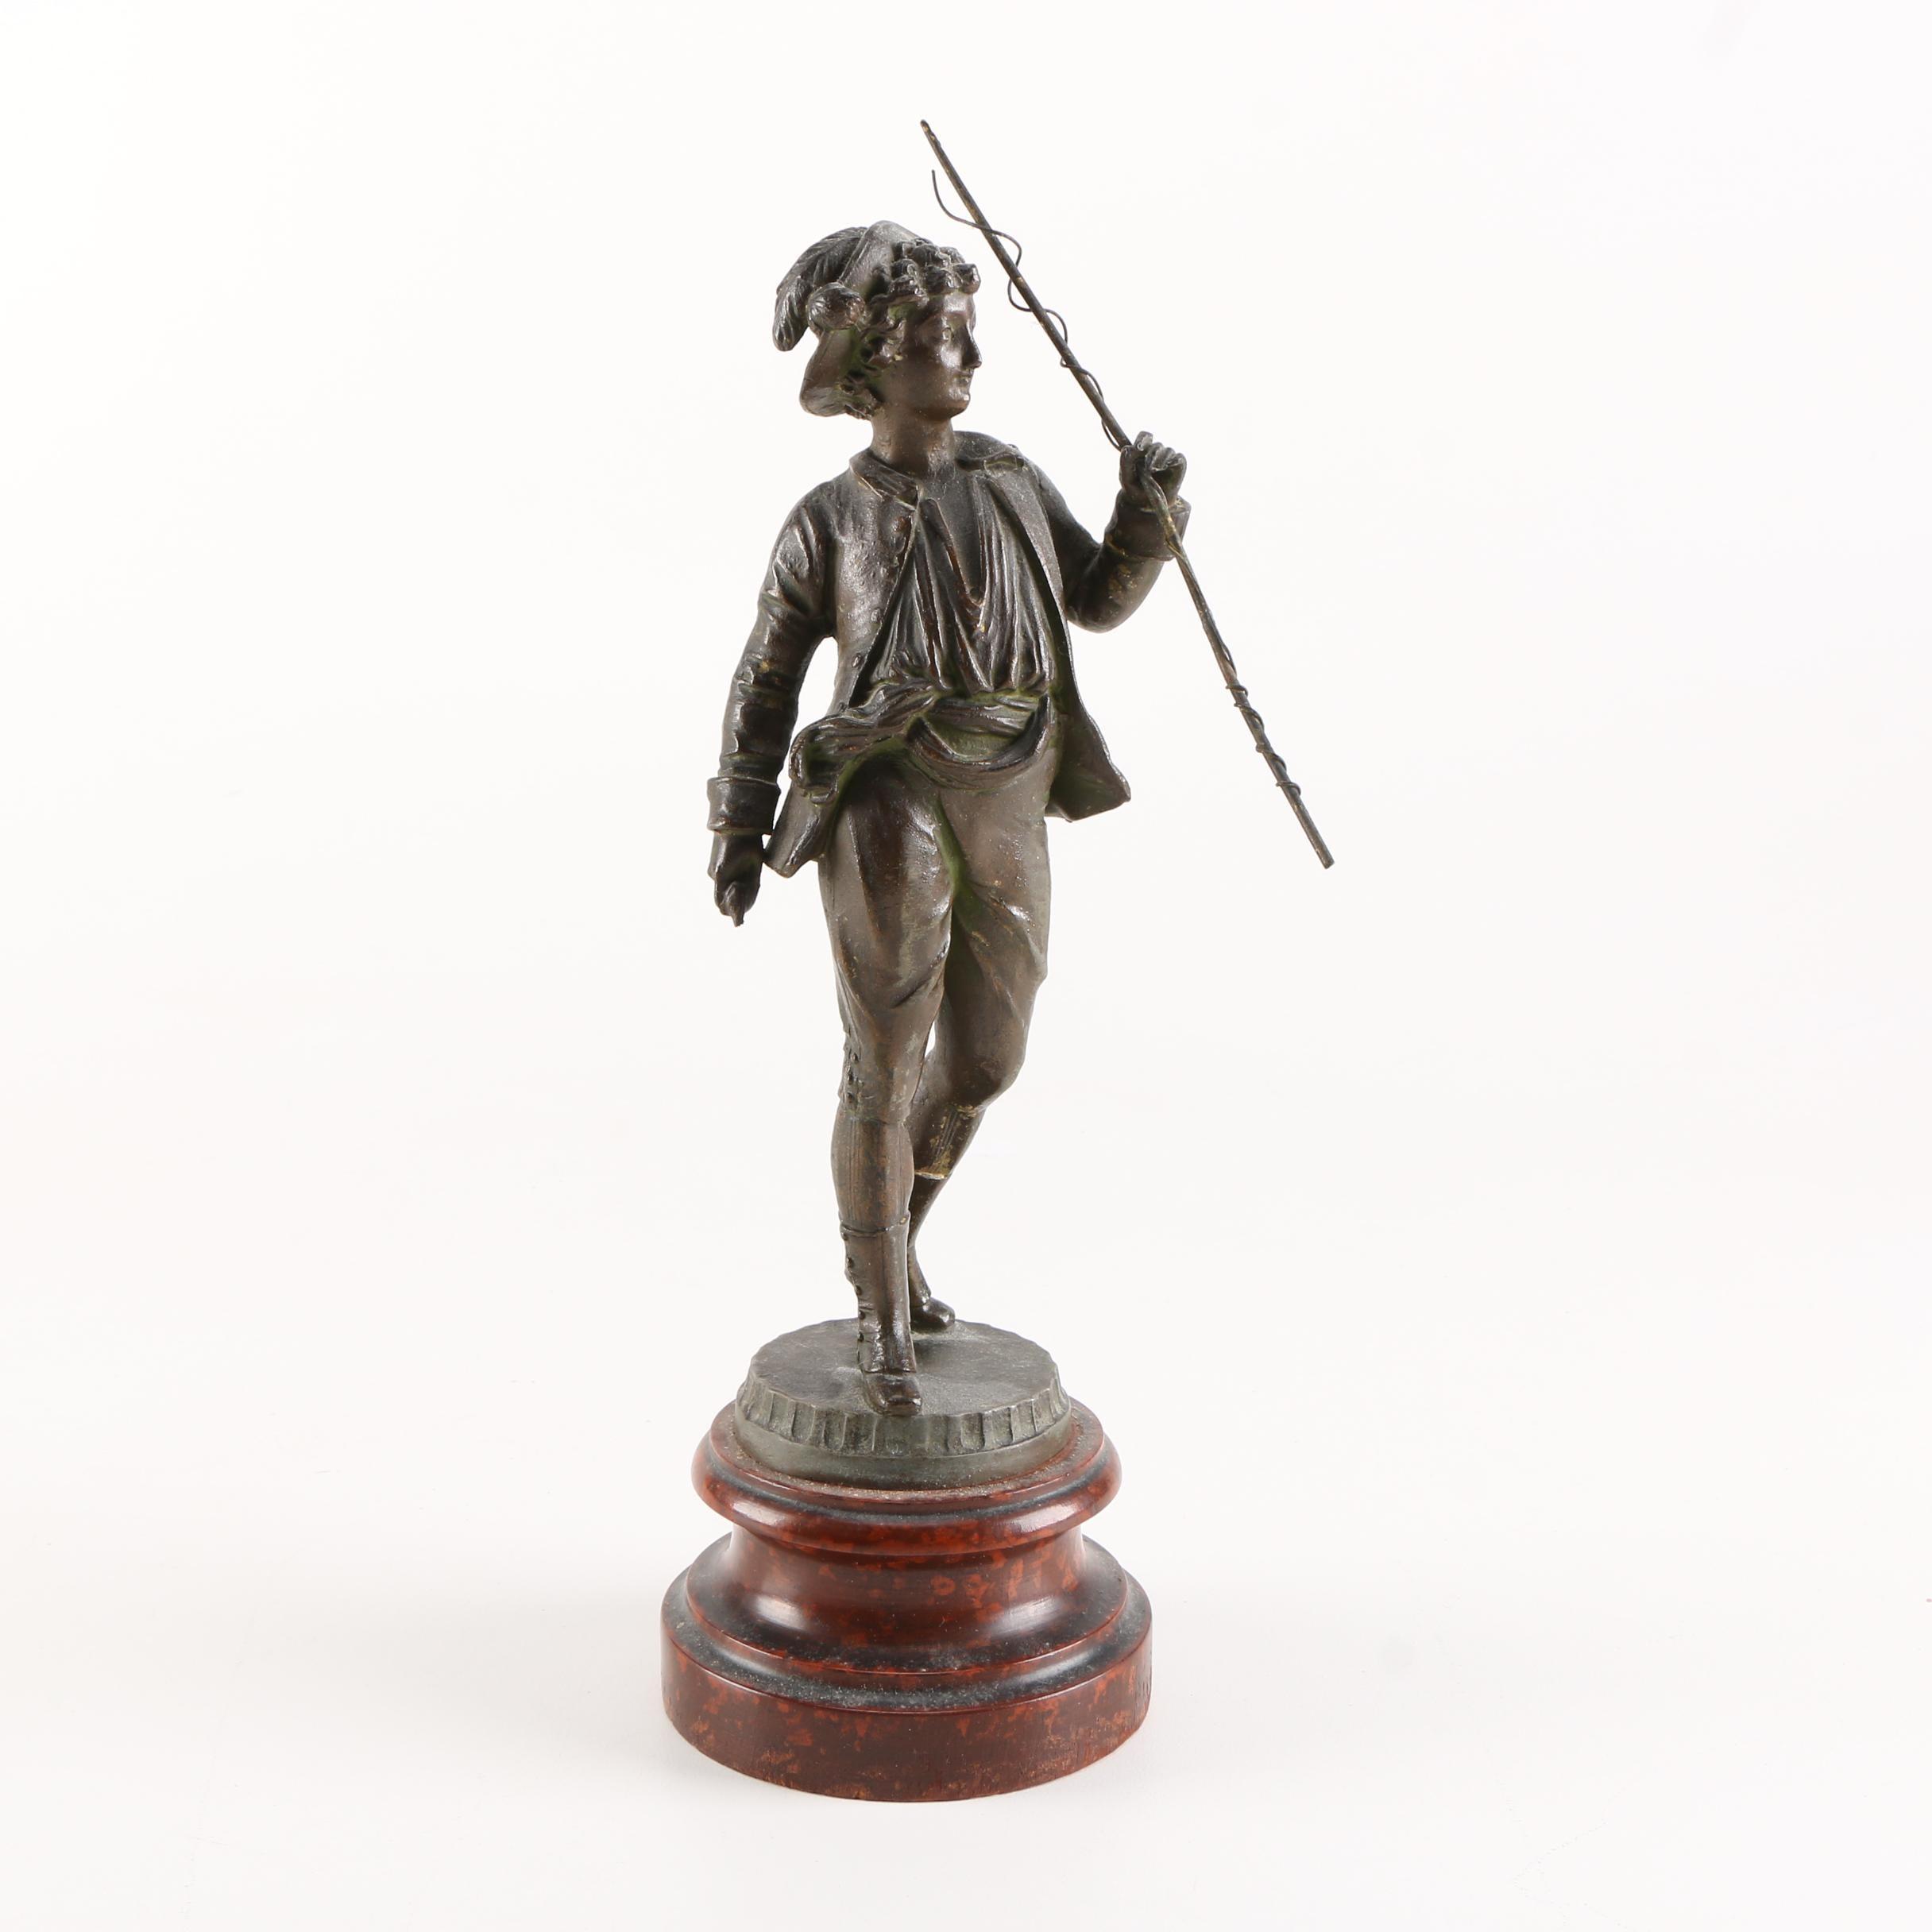 Bronze Toned Metal Sculpture of a Boy